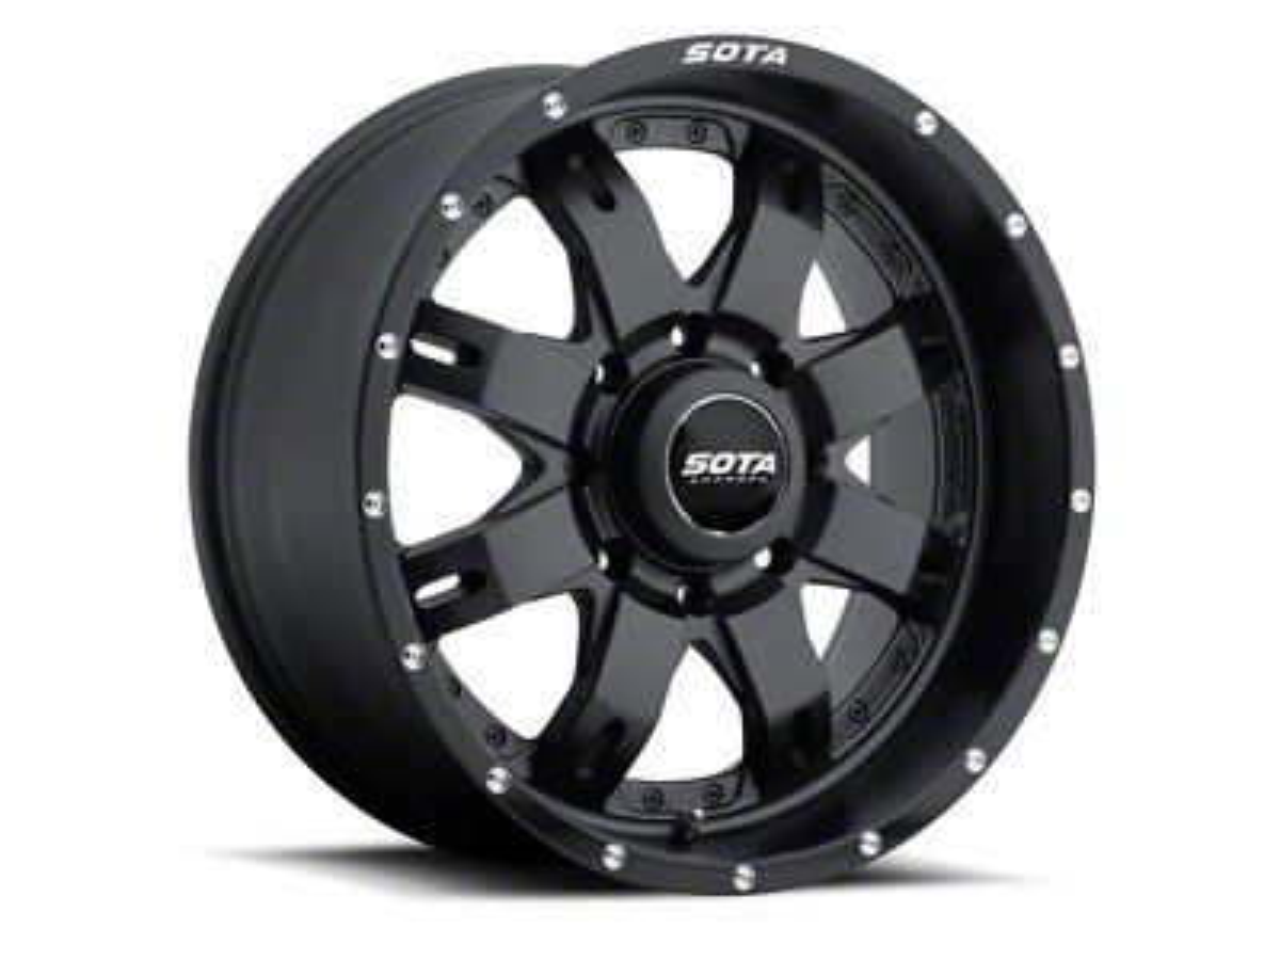 SOTA Off Road R.E.P.R. 8 Stealth Black 8-Lug Wheel - 20x10 (06-08 RAM 1500 Mega Cab)